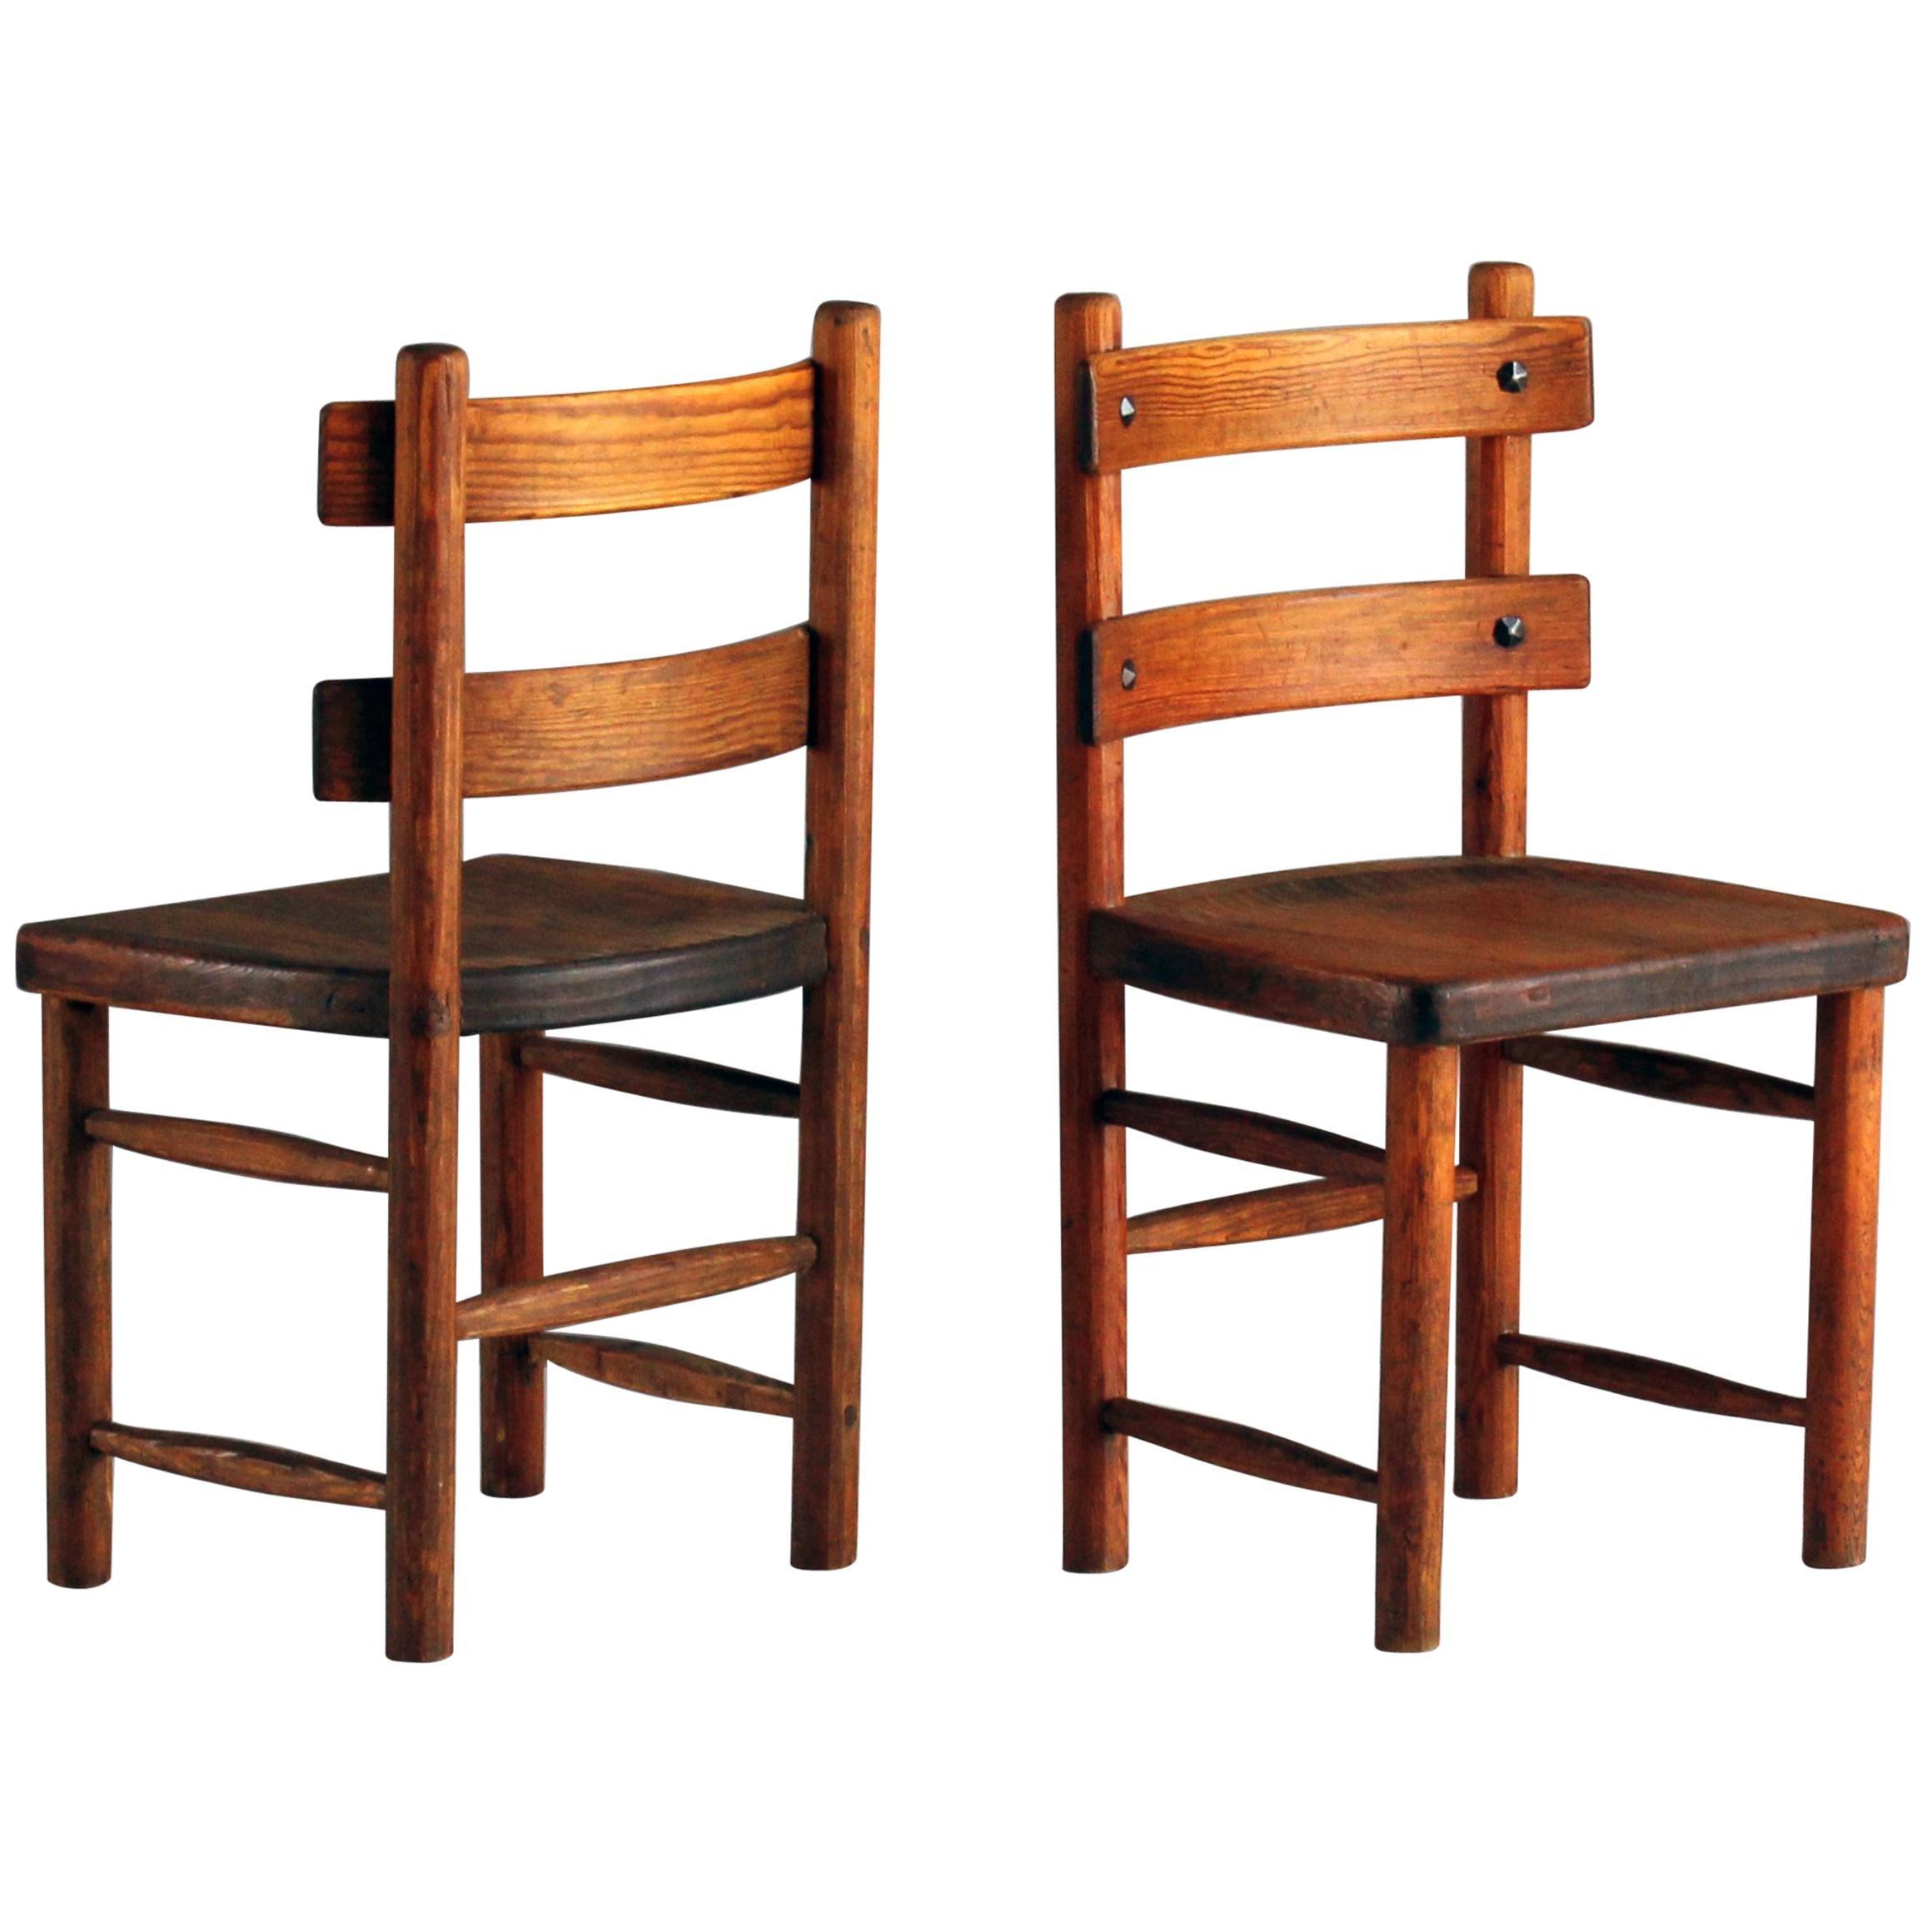 "Axel Einar Hjorth, Pair of ""Sandhamn"" Side Chairs, Pine, Wrought Iron, 1931"